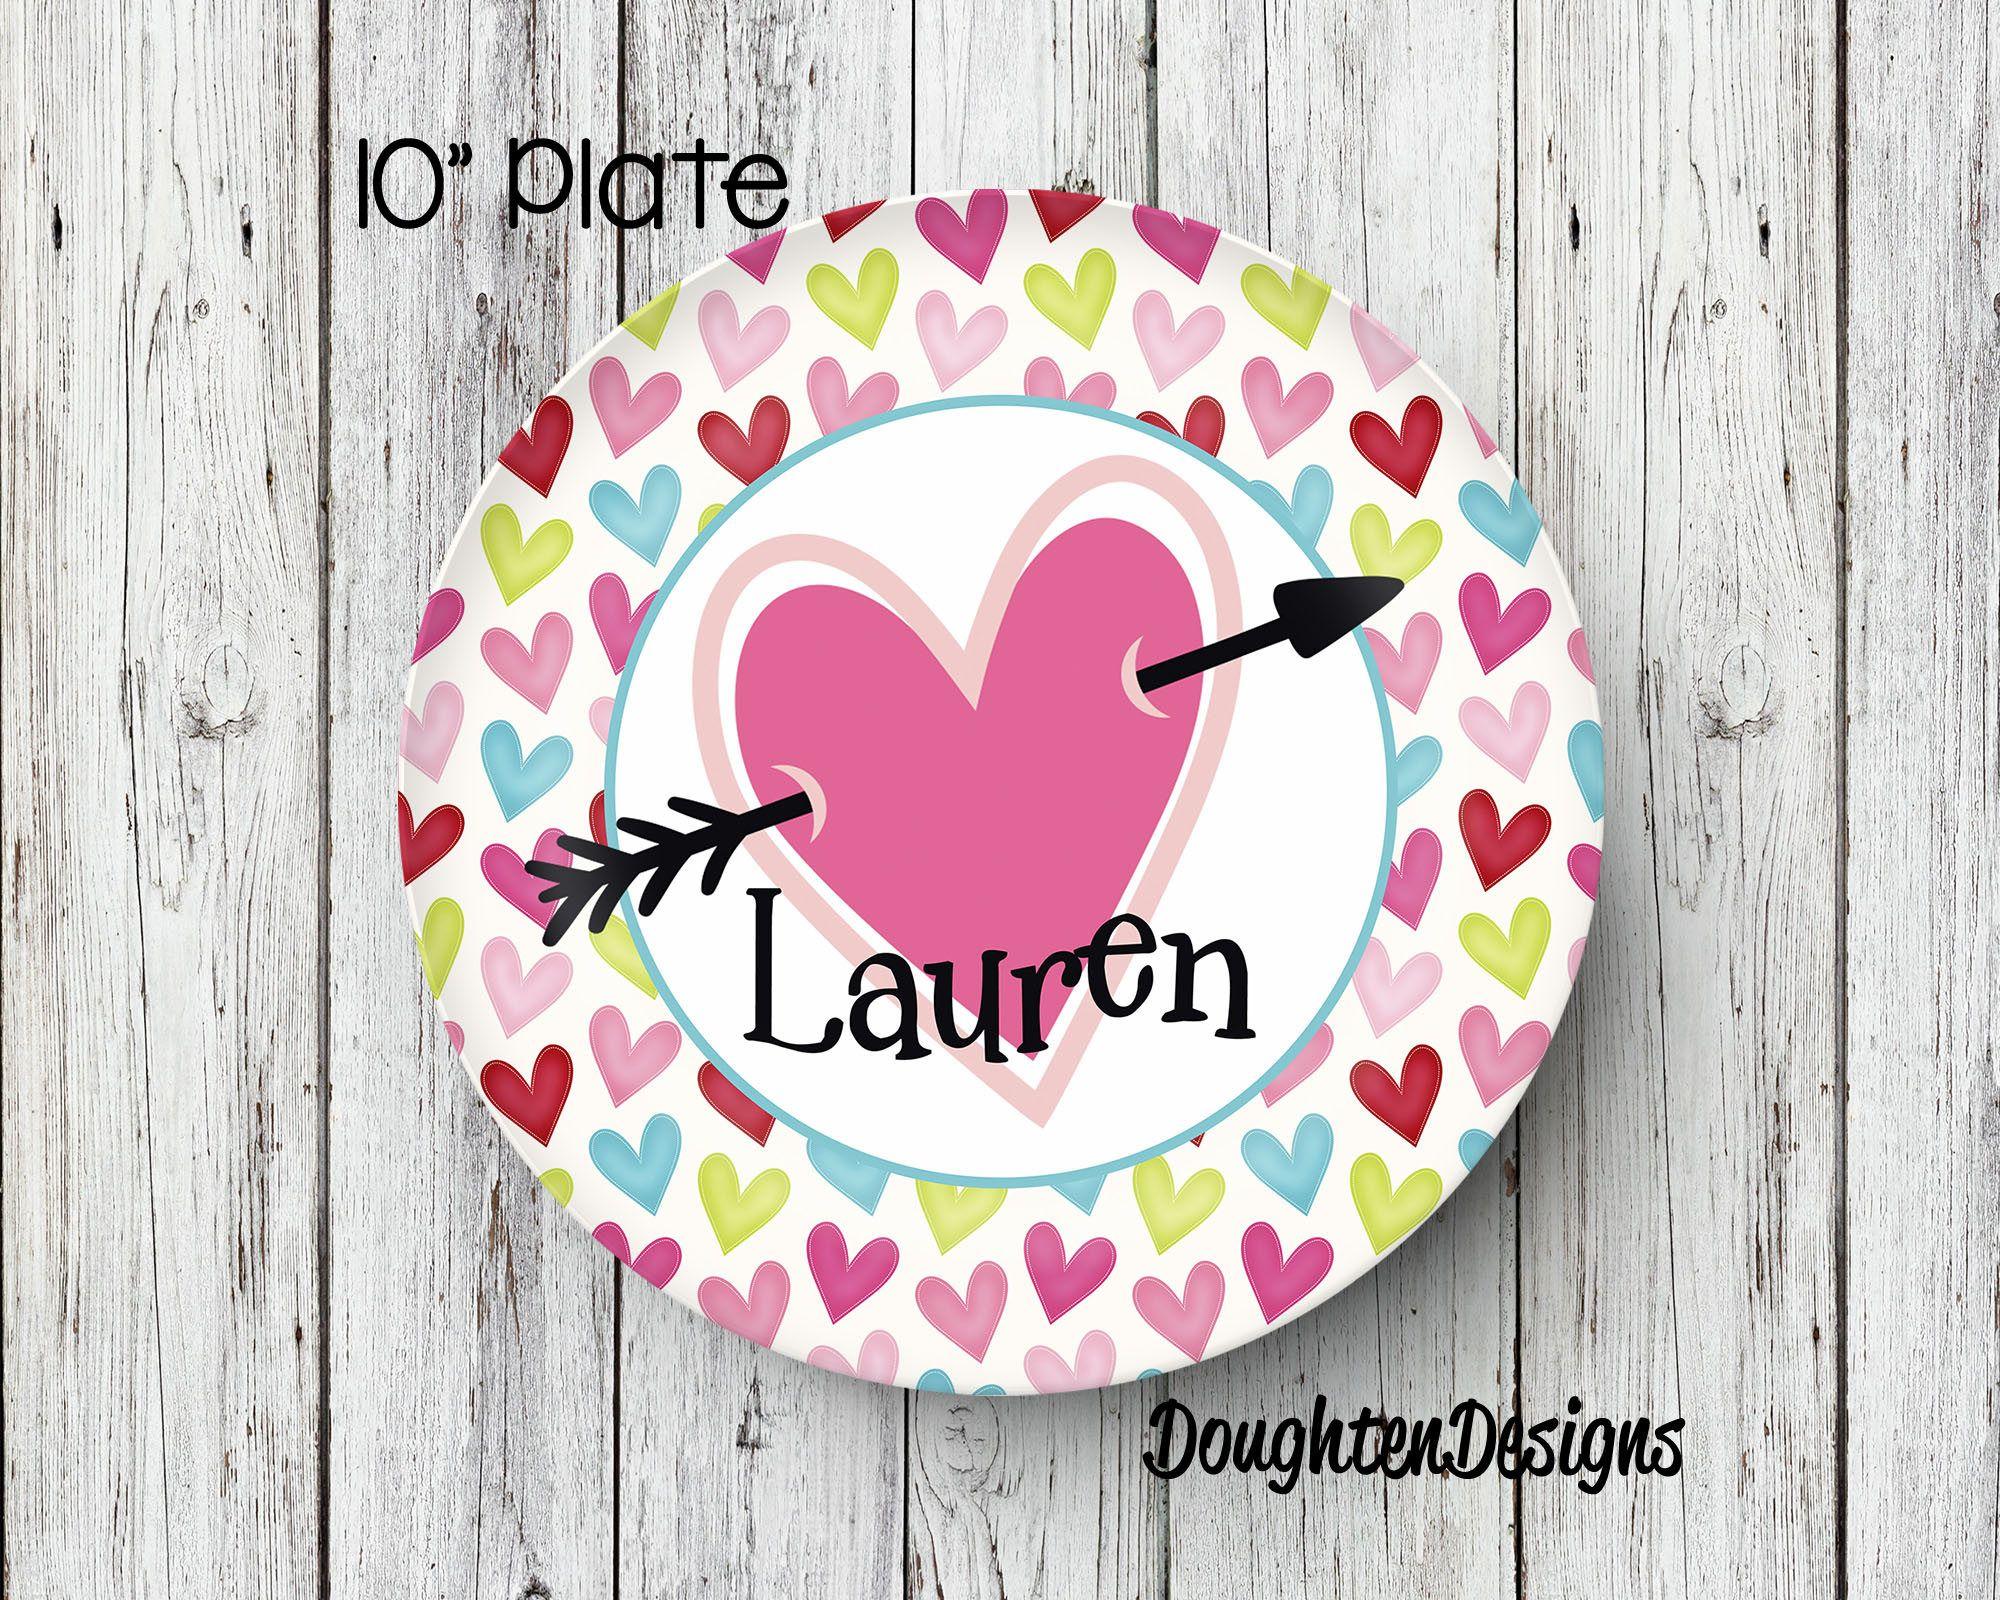 Valentineu0027s Plate Personalized Melamine Plate Valentineu0027s Day Plate Personalized Valentine Plate Personalized  sc 1 st  Pinterest & Valentineu0027s Plate Personalized Melamine Plate Valentineu0027s Day ...